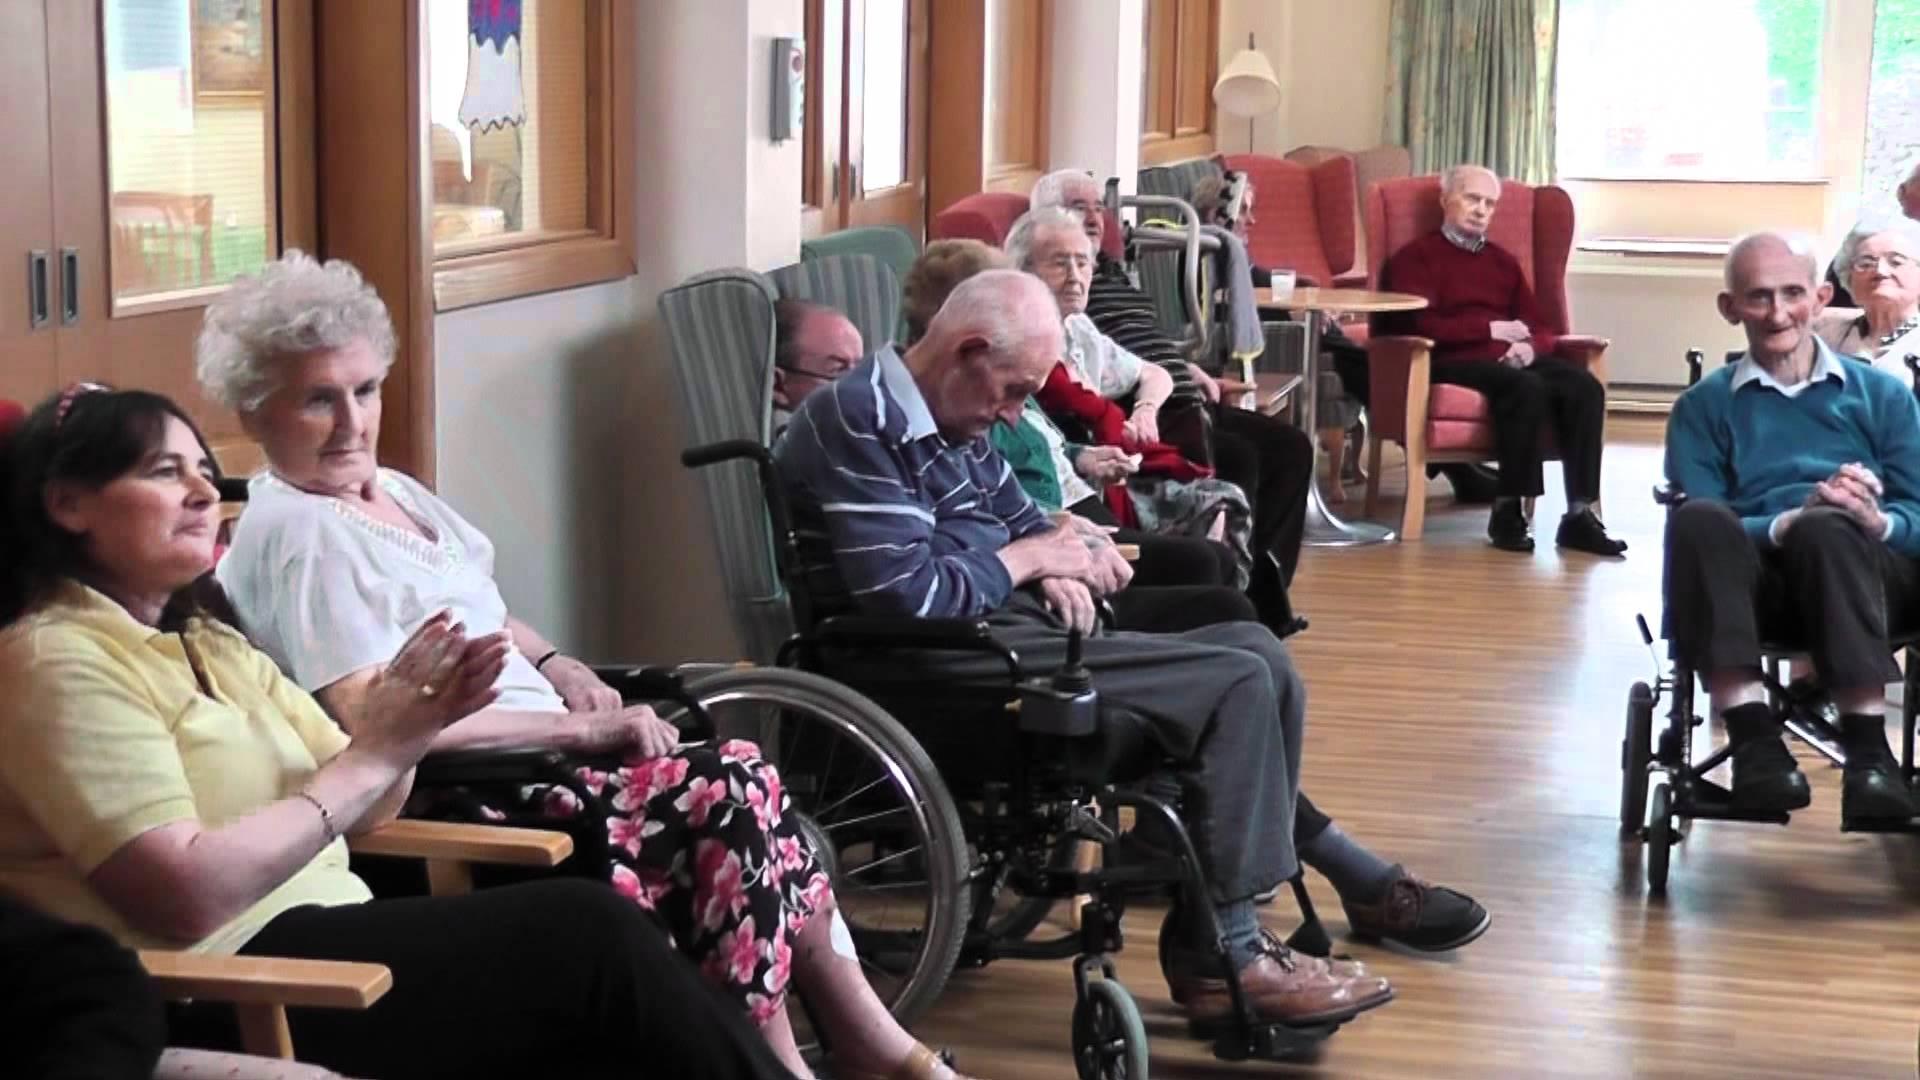 Stitt To Allow Phased Resumption Of Nursing Home Visits Starting Monday Public Radio Tulsa